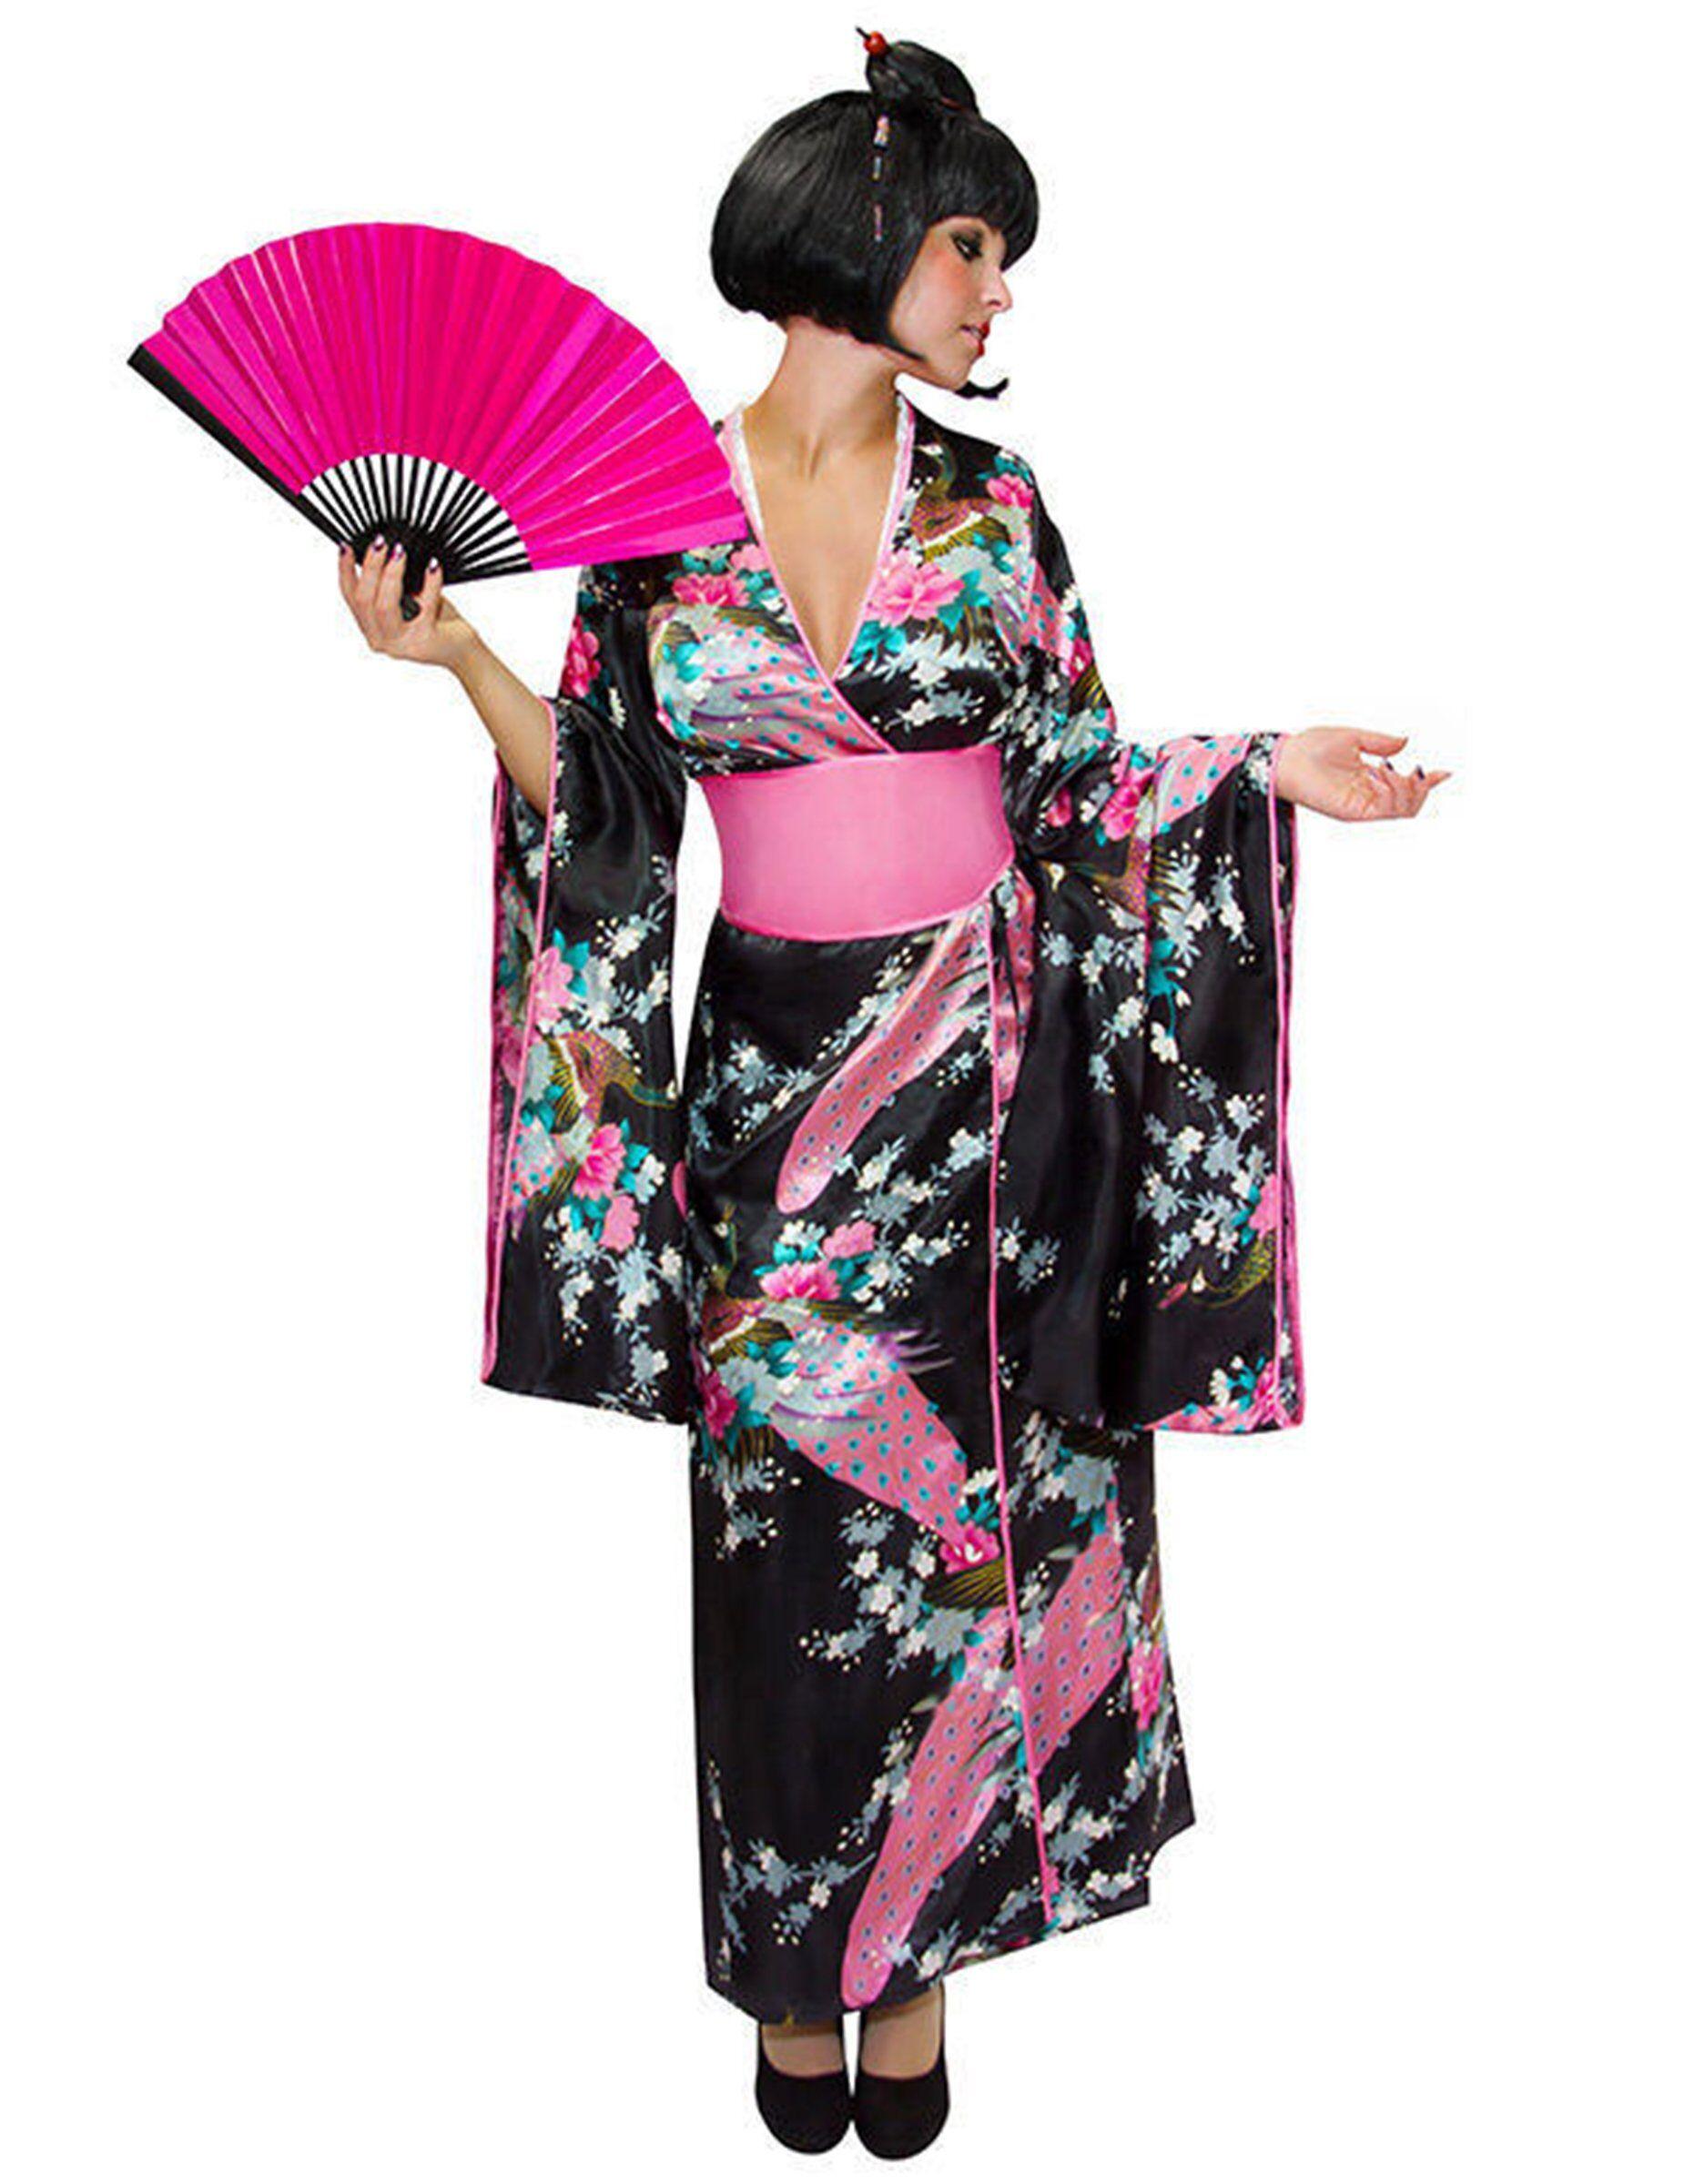 Deguisetoi Déguisement kimono japonais femme - Taille: XS / S